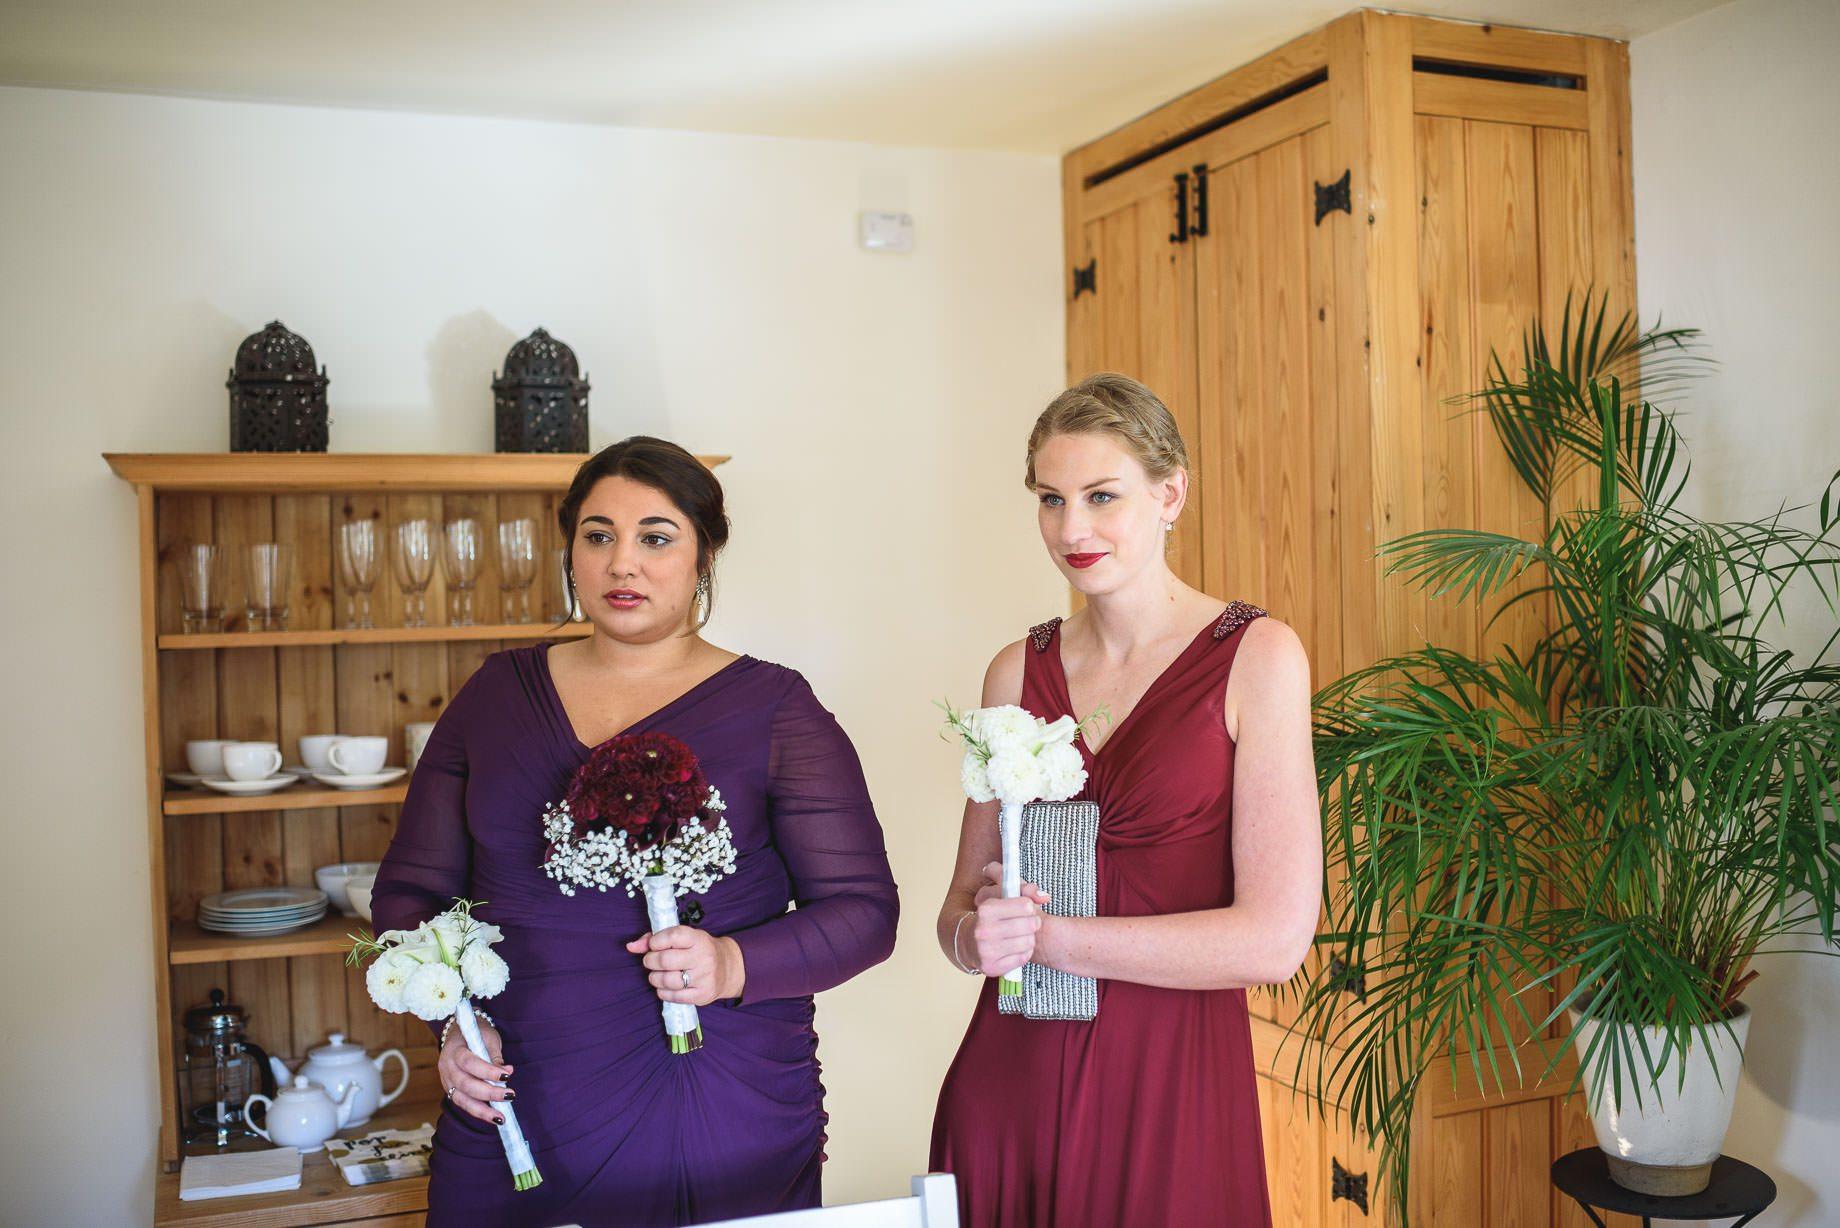 bury-court-barn-wedding-photography-guy-collier-photography-nadia-tom-39-of-184